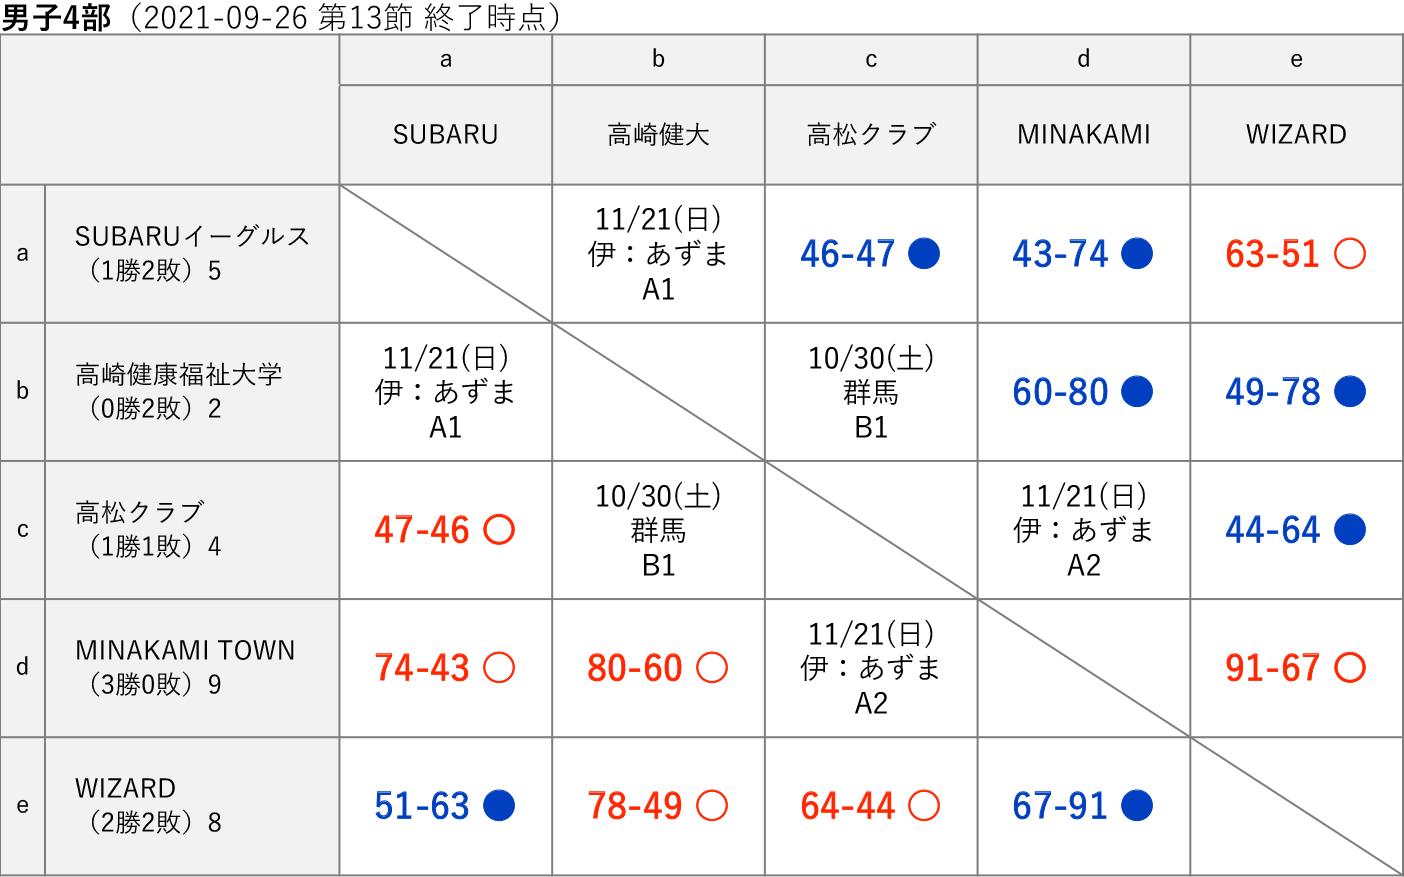 2021社会人リーグ 男子4部 星取り表(2021-09-26 第13節終了時)